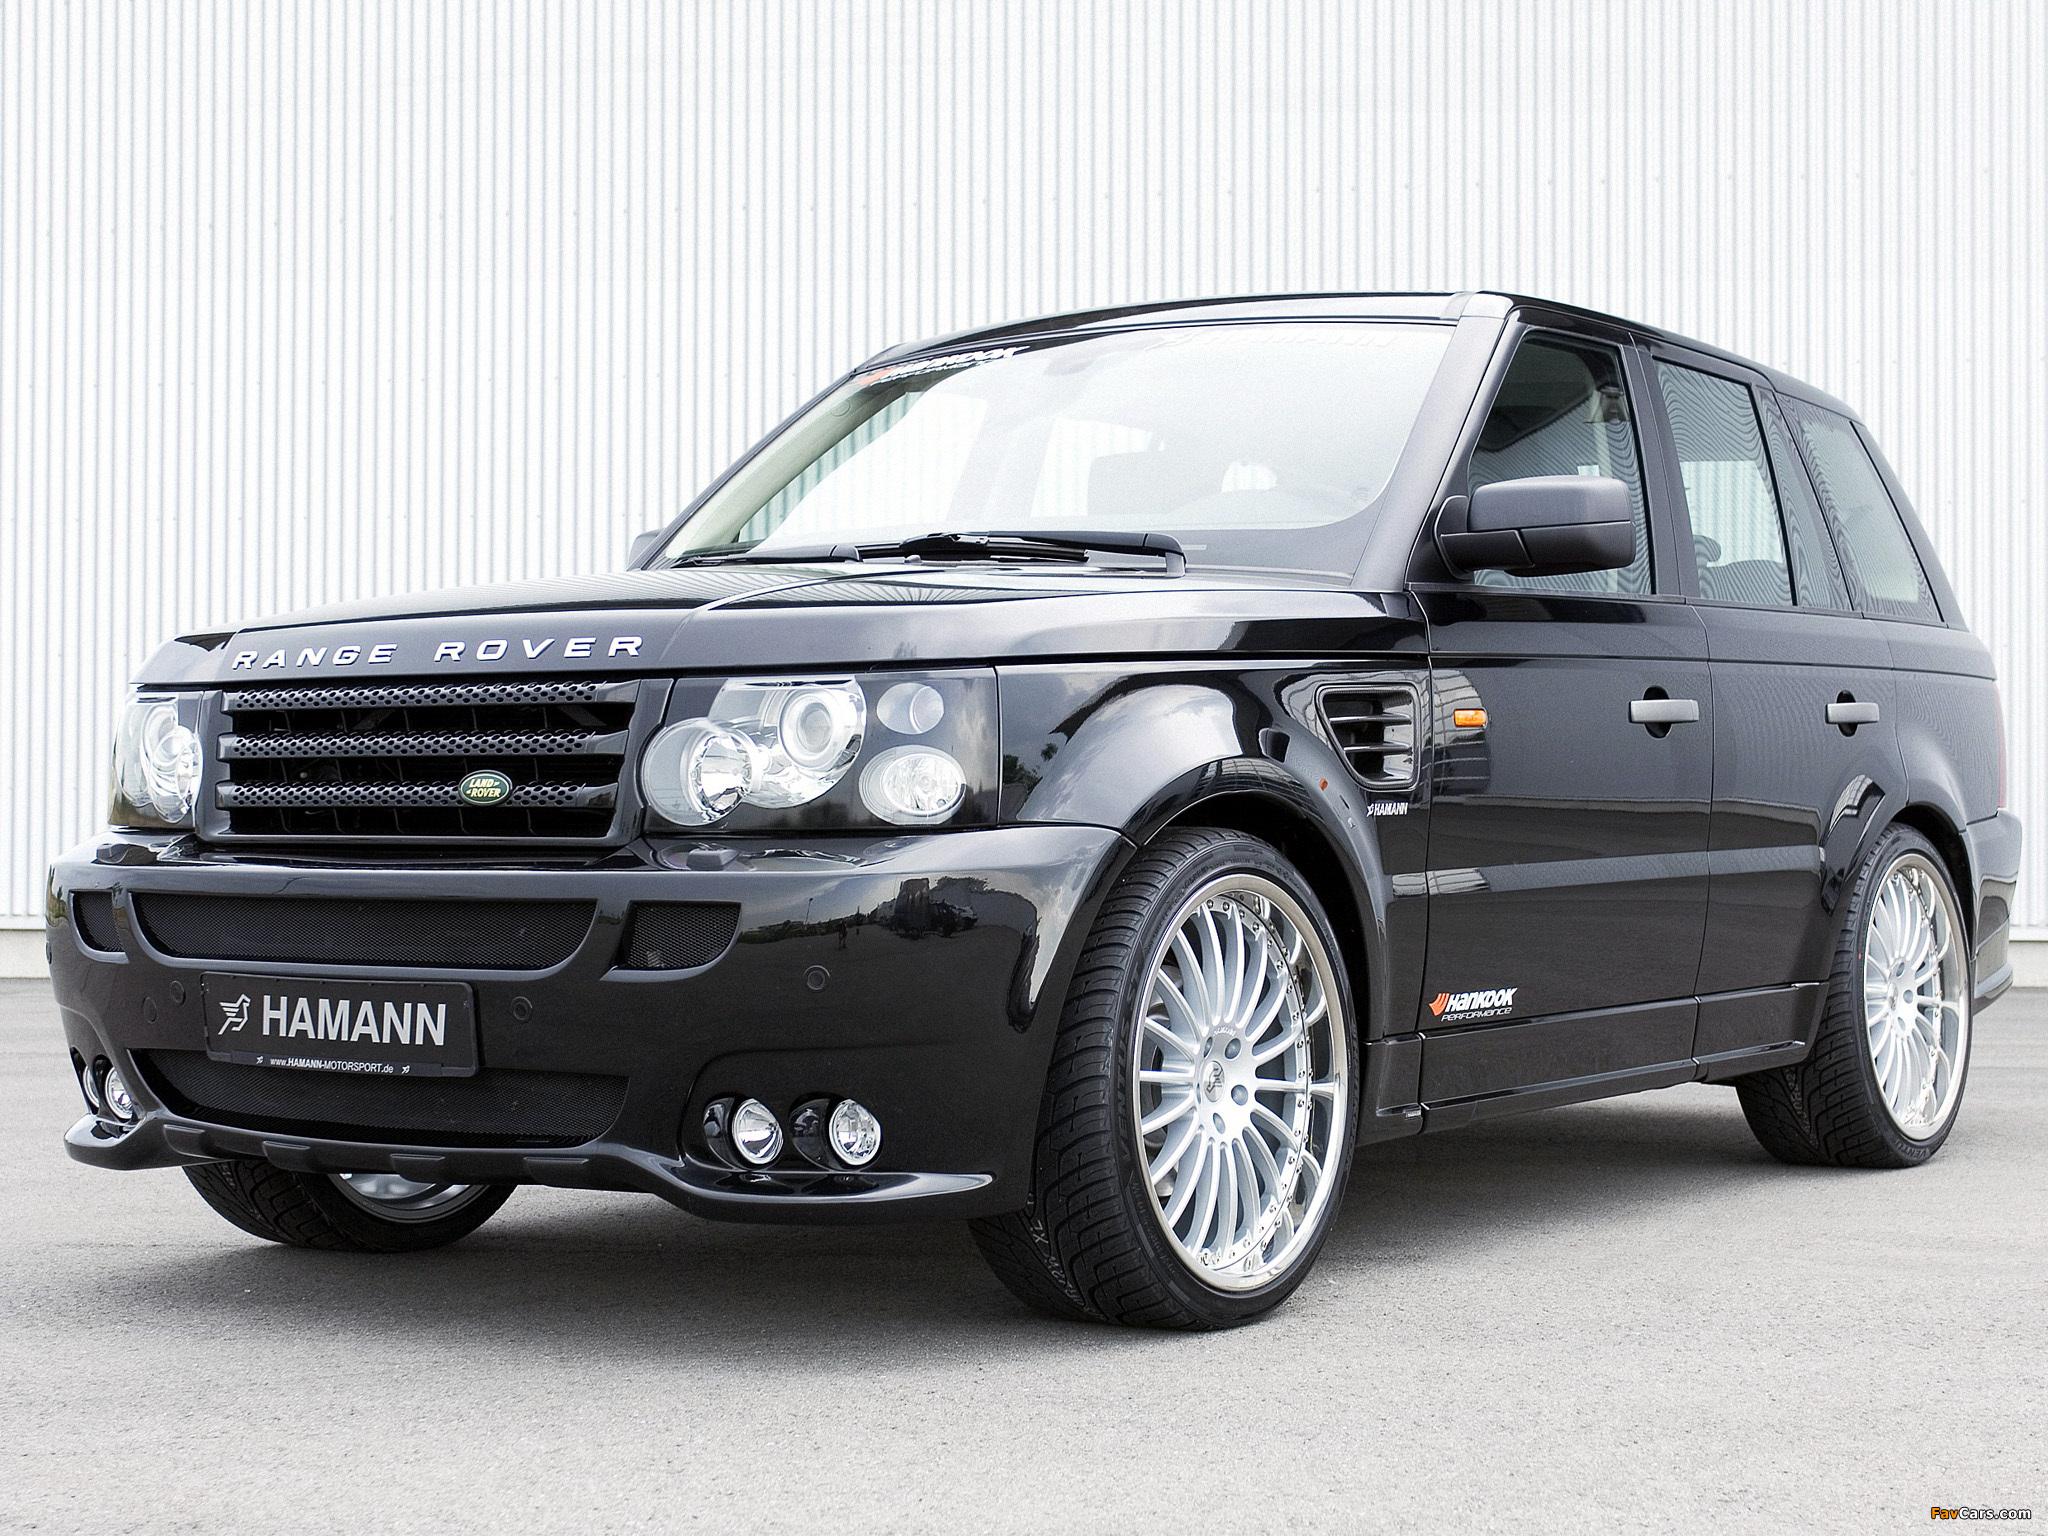 Hamann Range Rover Sport 2006 wallpapers (2048 x 1536)